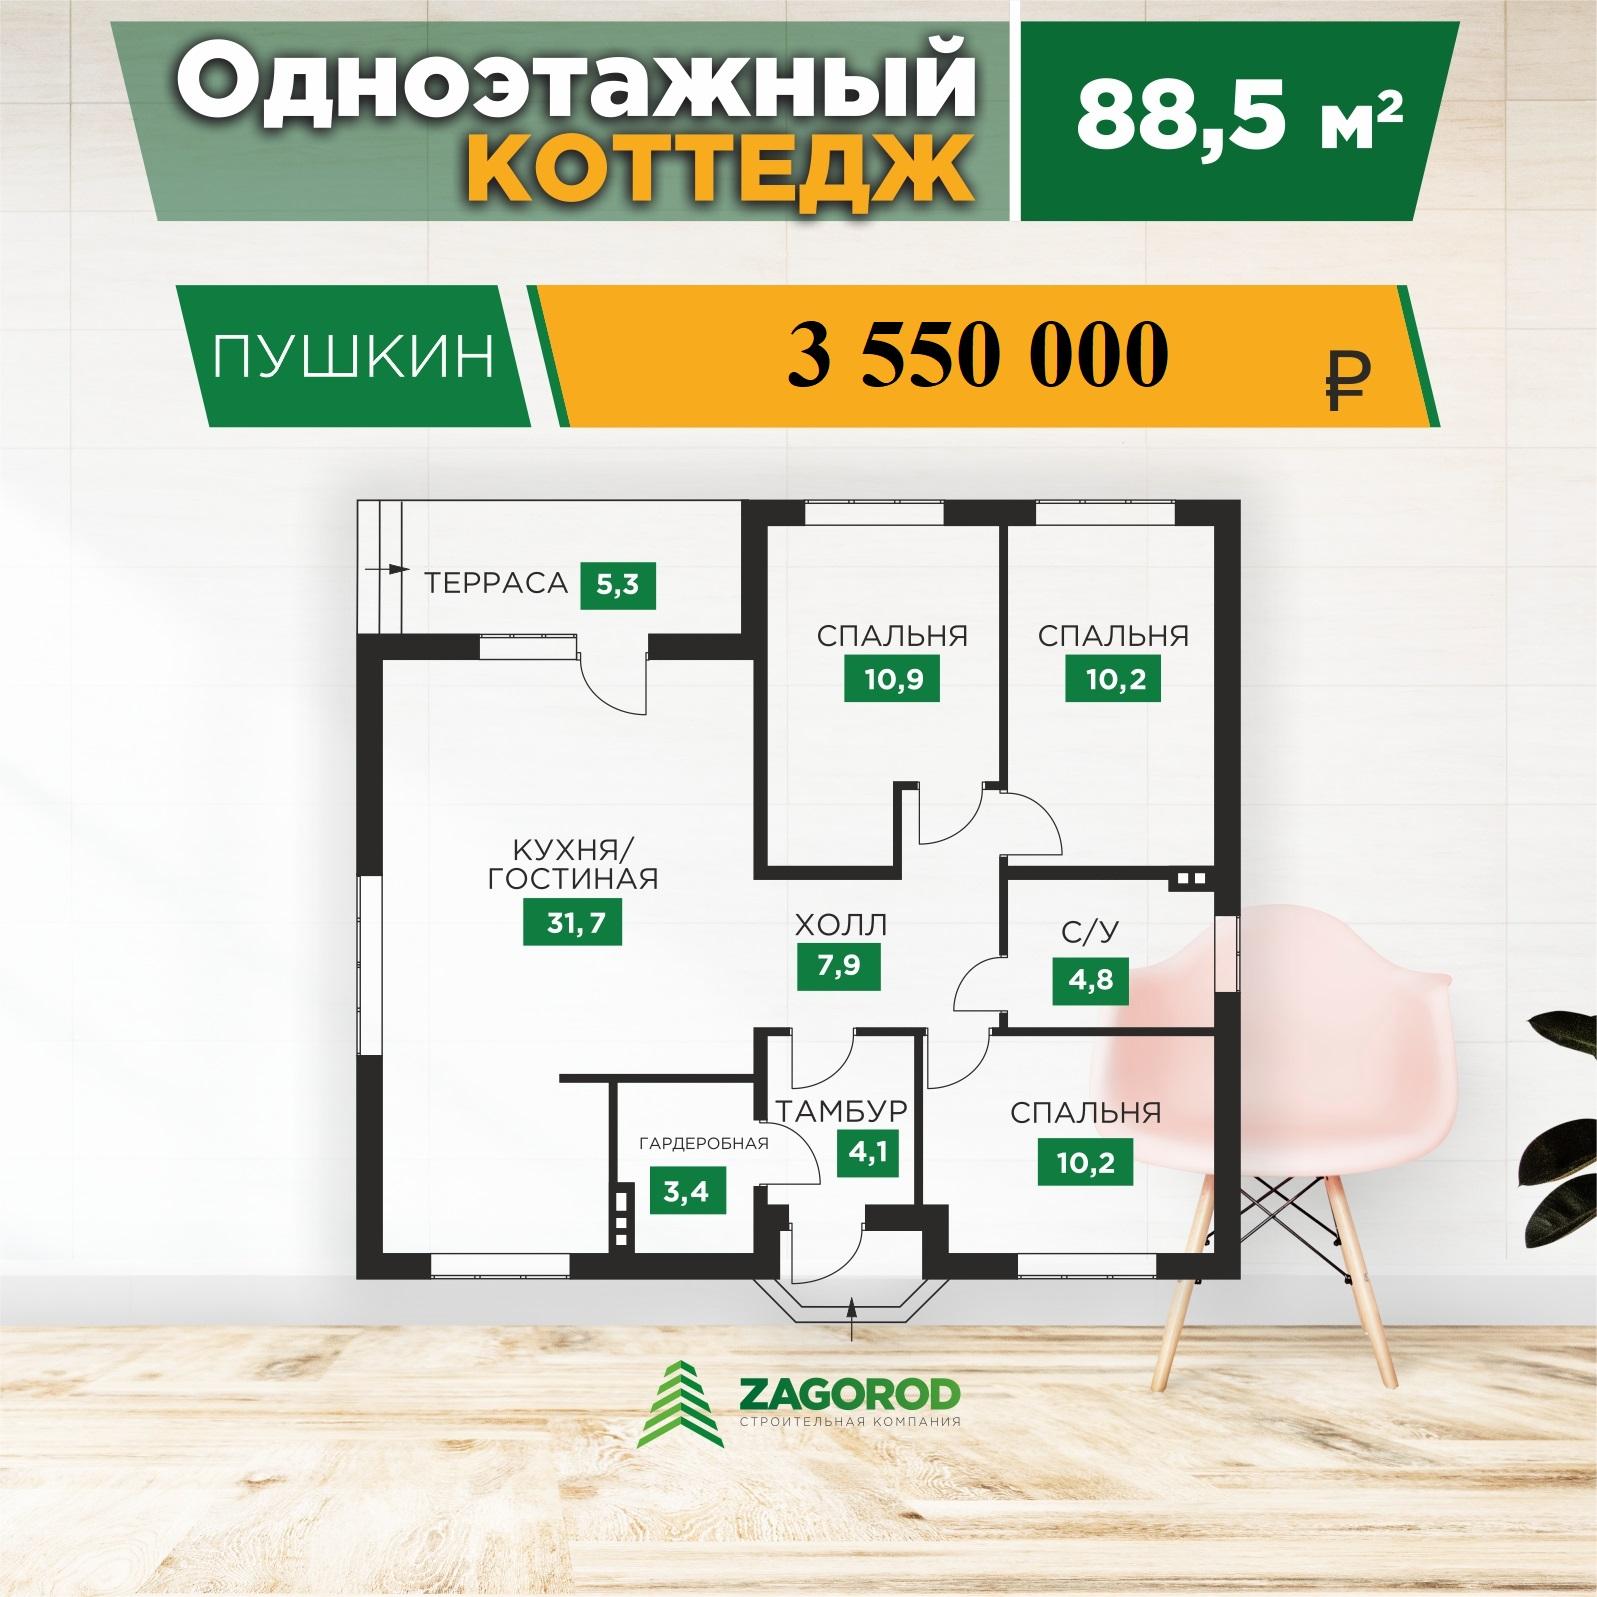 Коттедж «Пушкин» — 88,50 м2